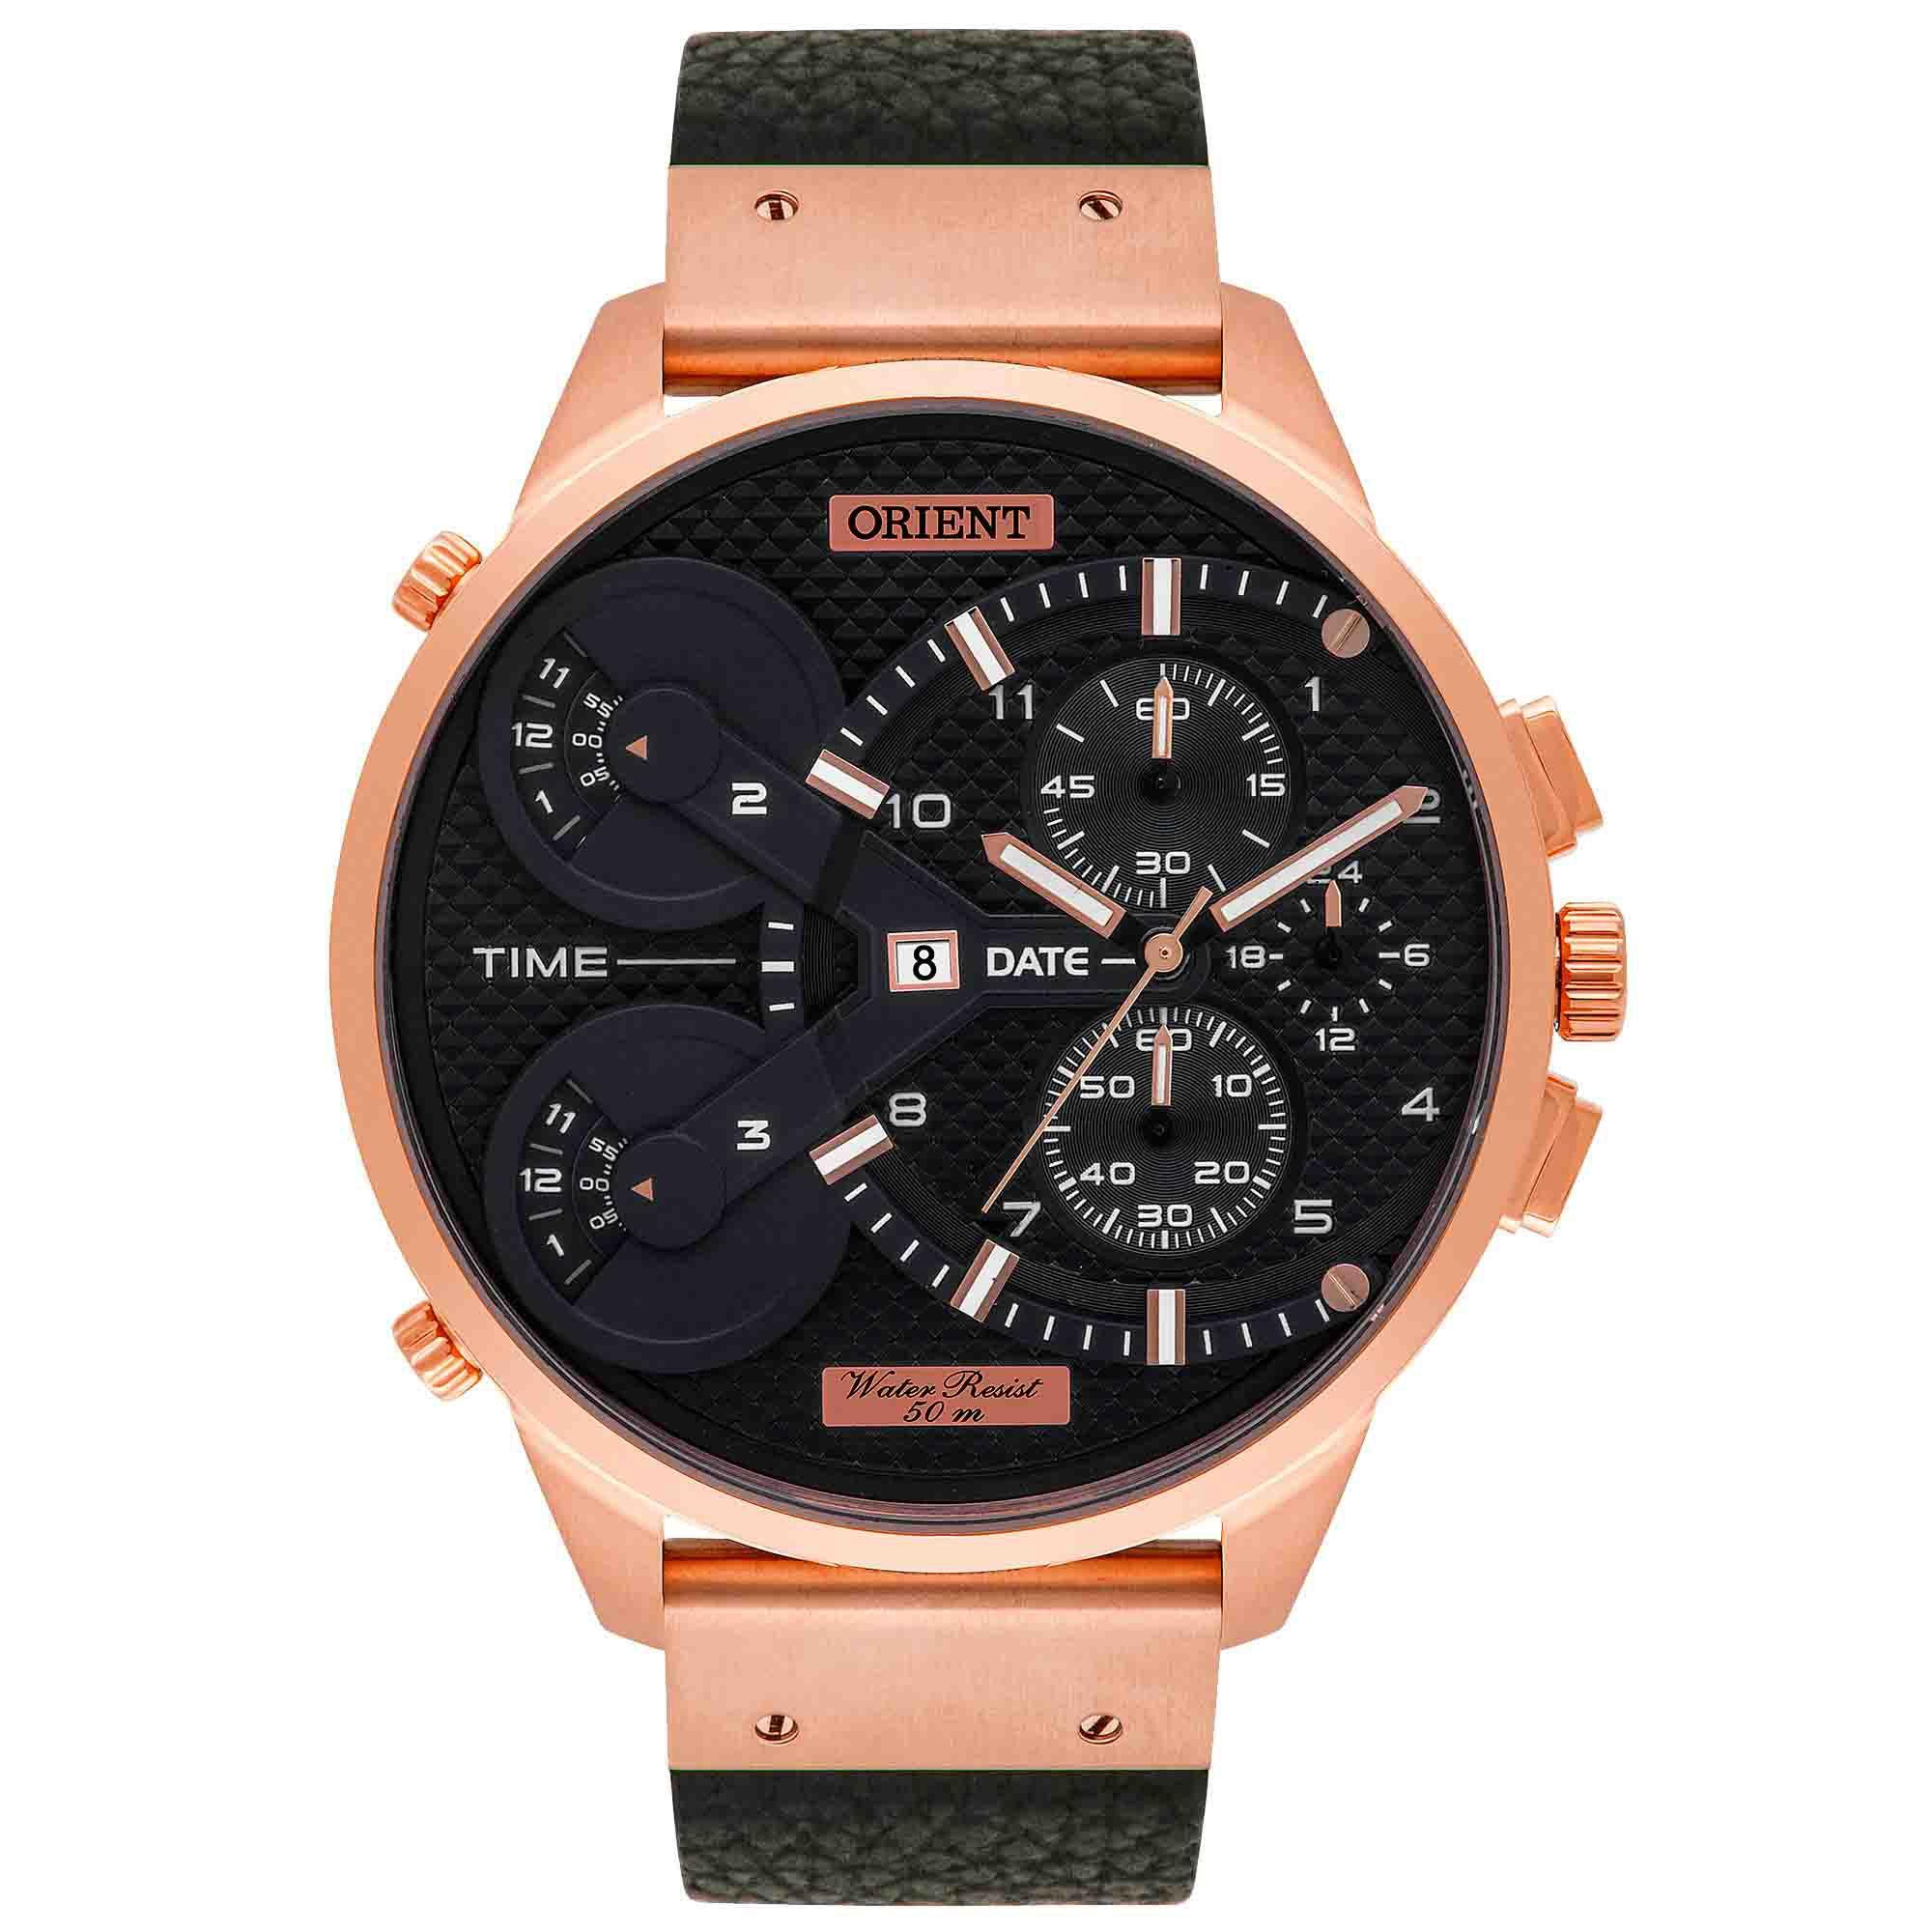 Relógio Masculino Orient MRSCT003 P2PX